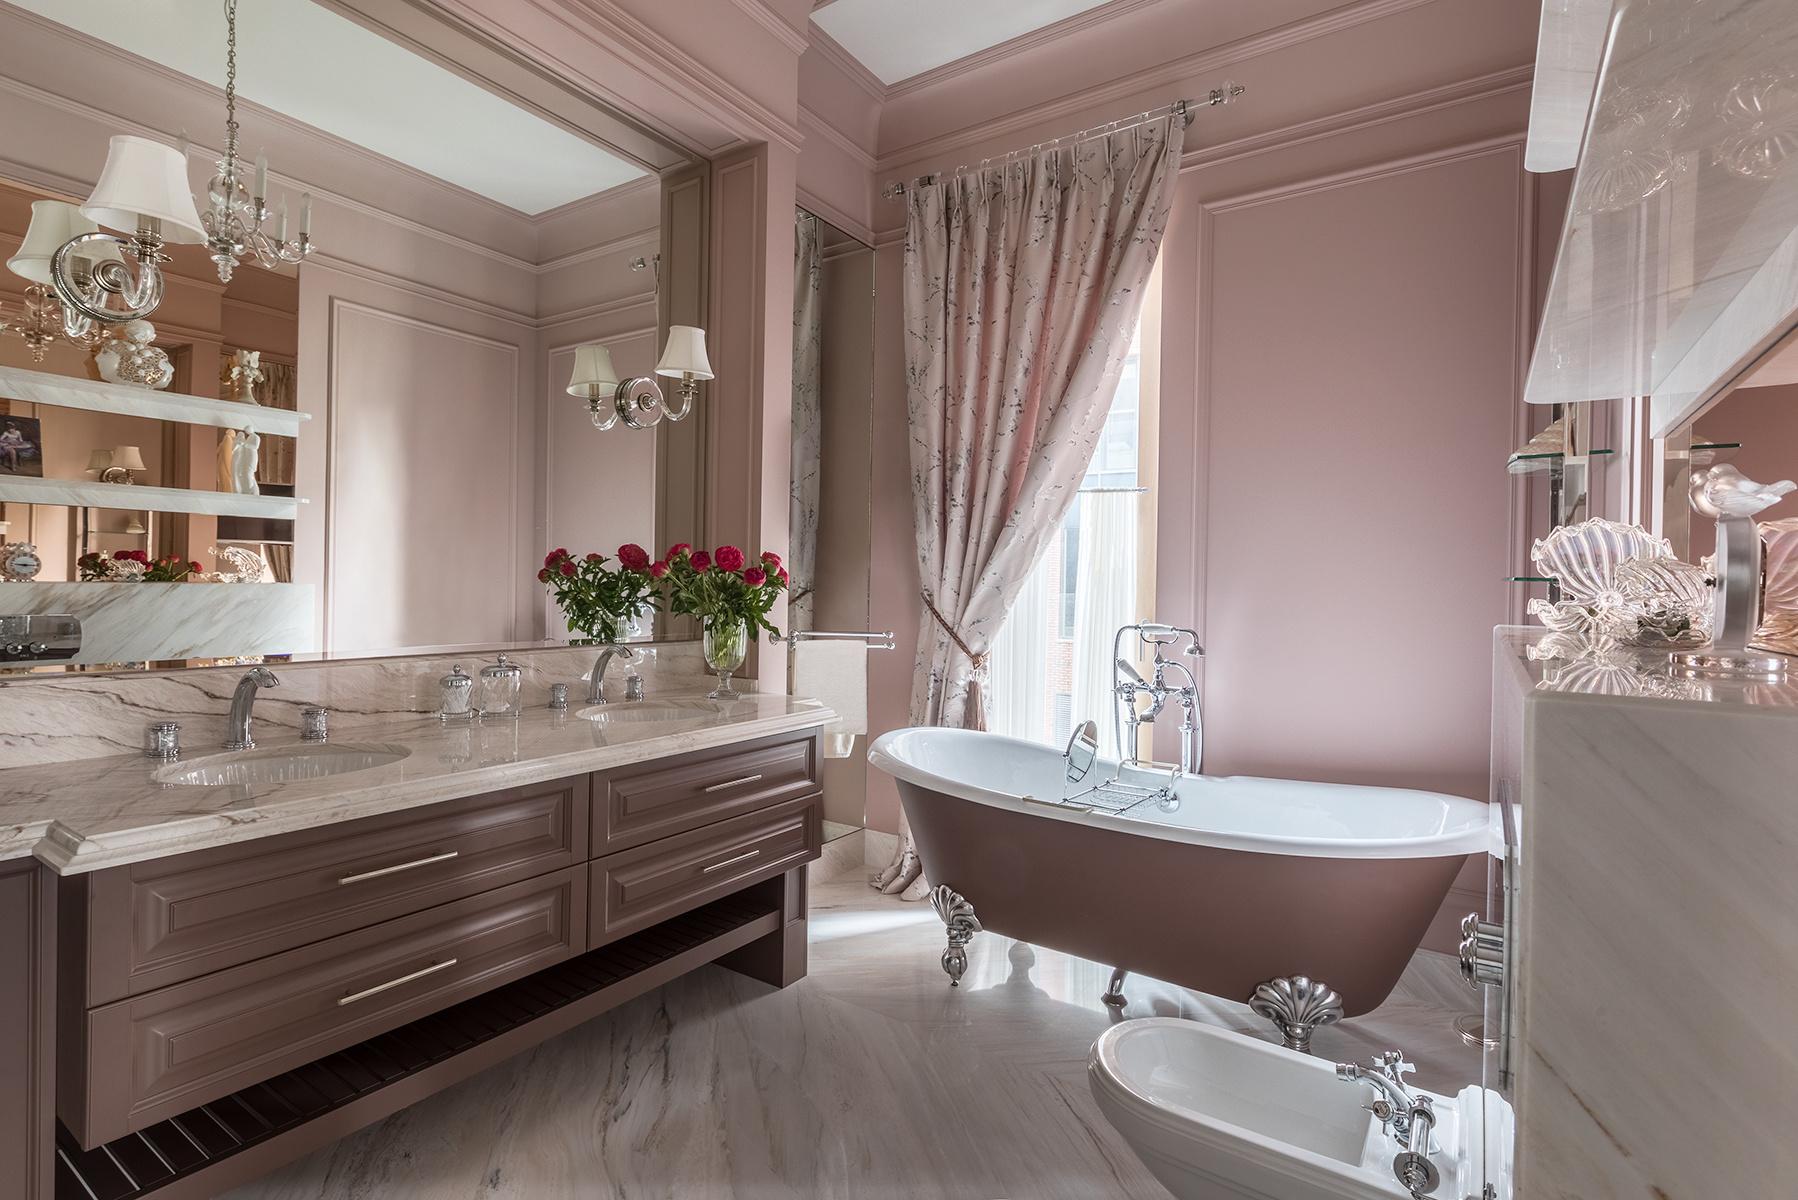 Розовая пудра: 12 ванных комнат в розовой гамме (галерея 0, фото 4)